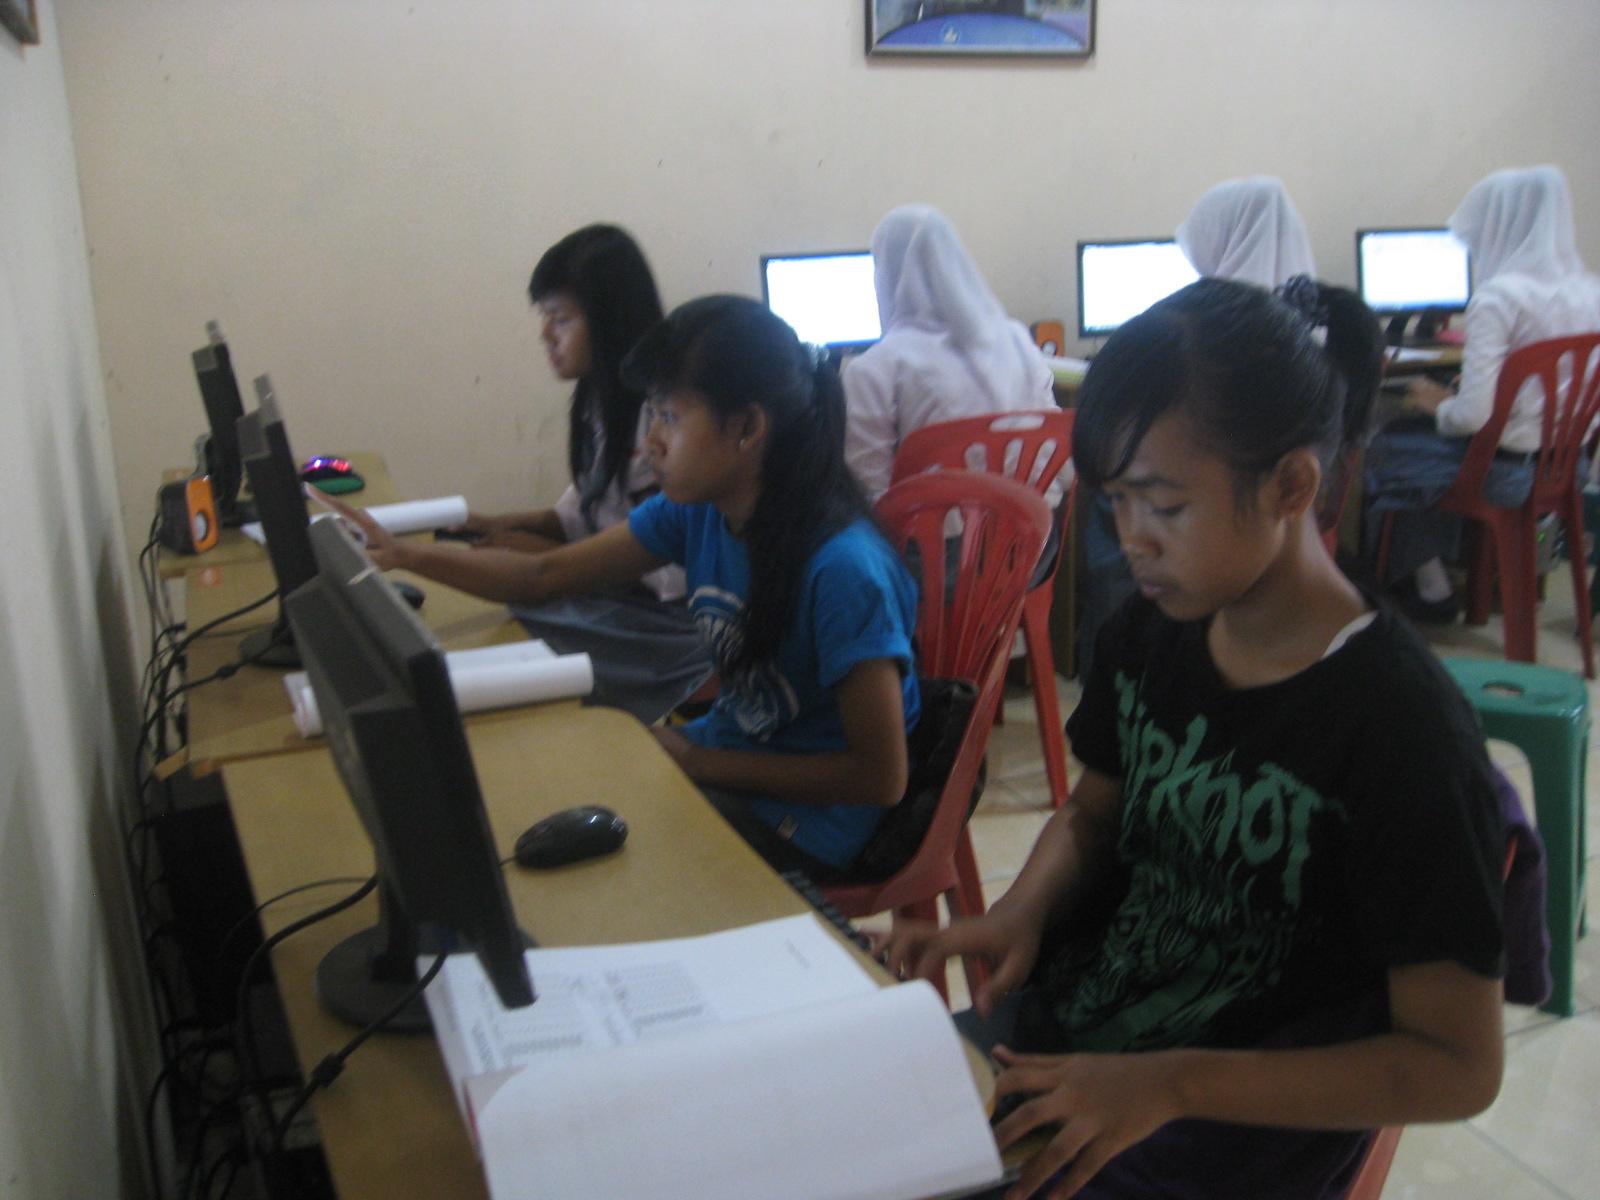 Peluang Usaha di Bidang Jasa Strategi Dan Analisa Peluang Usaha Jasa Kursus Komputer